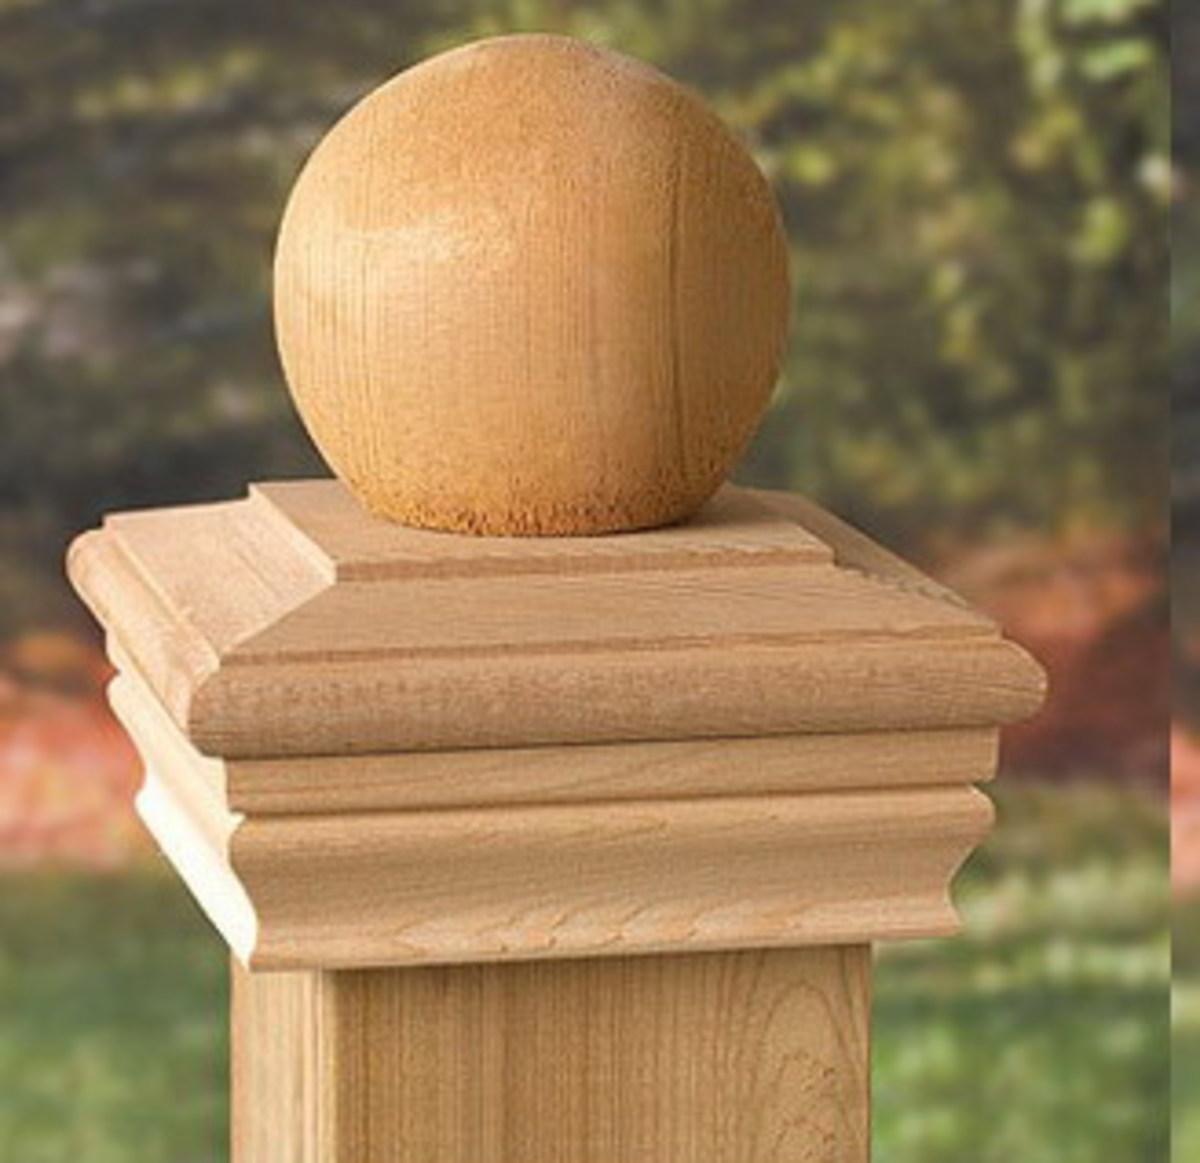 Hooverfence Newport Ball Cap.